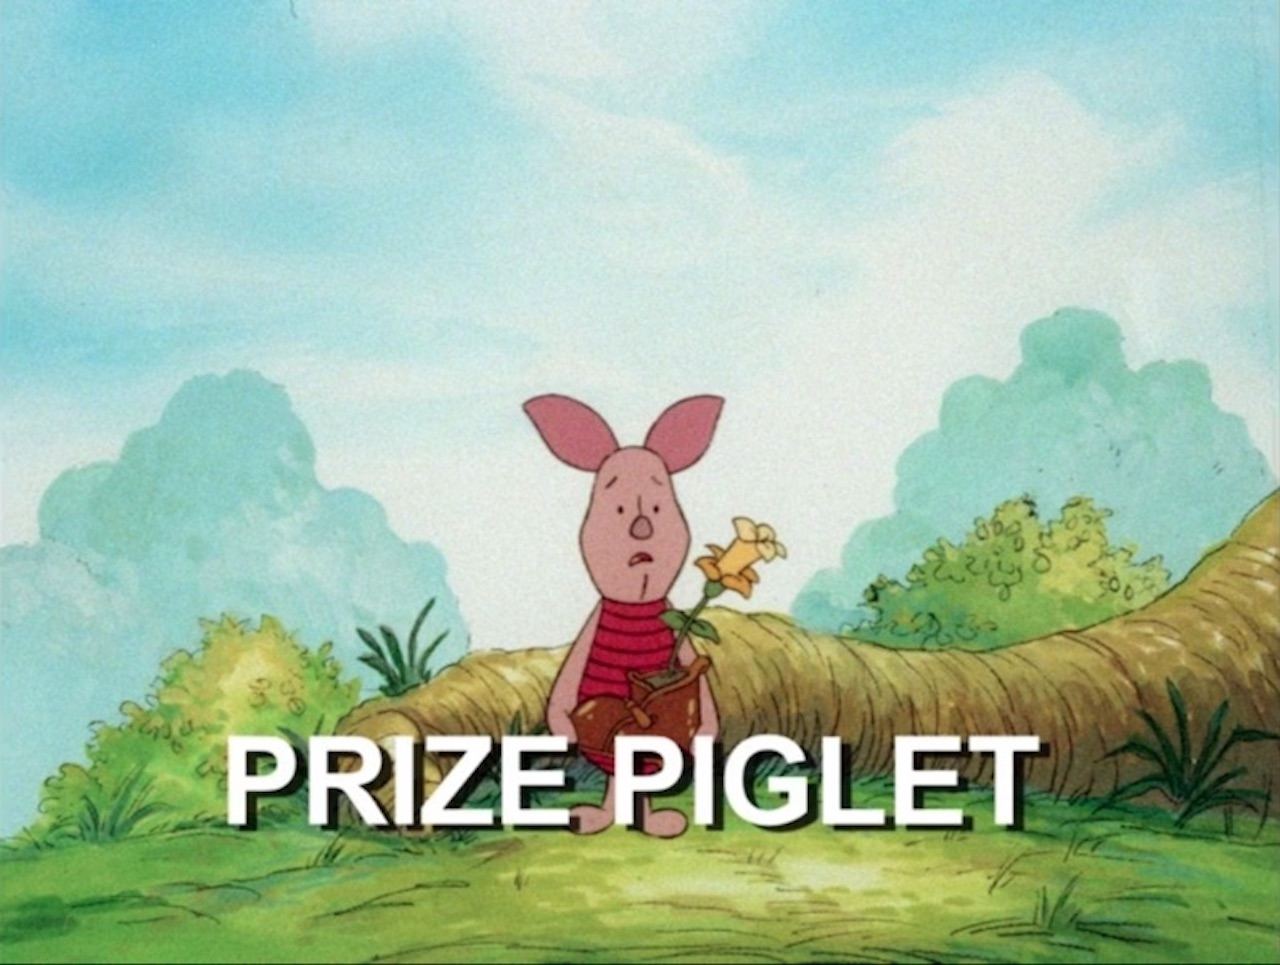 File:Prizepiglet.jpg